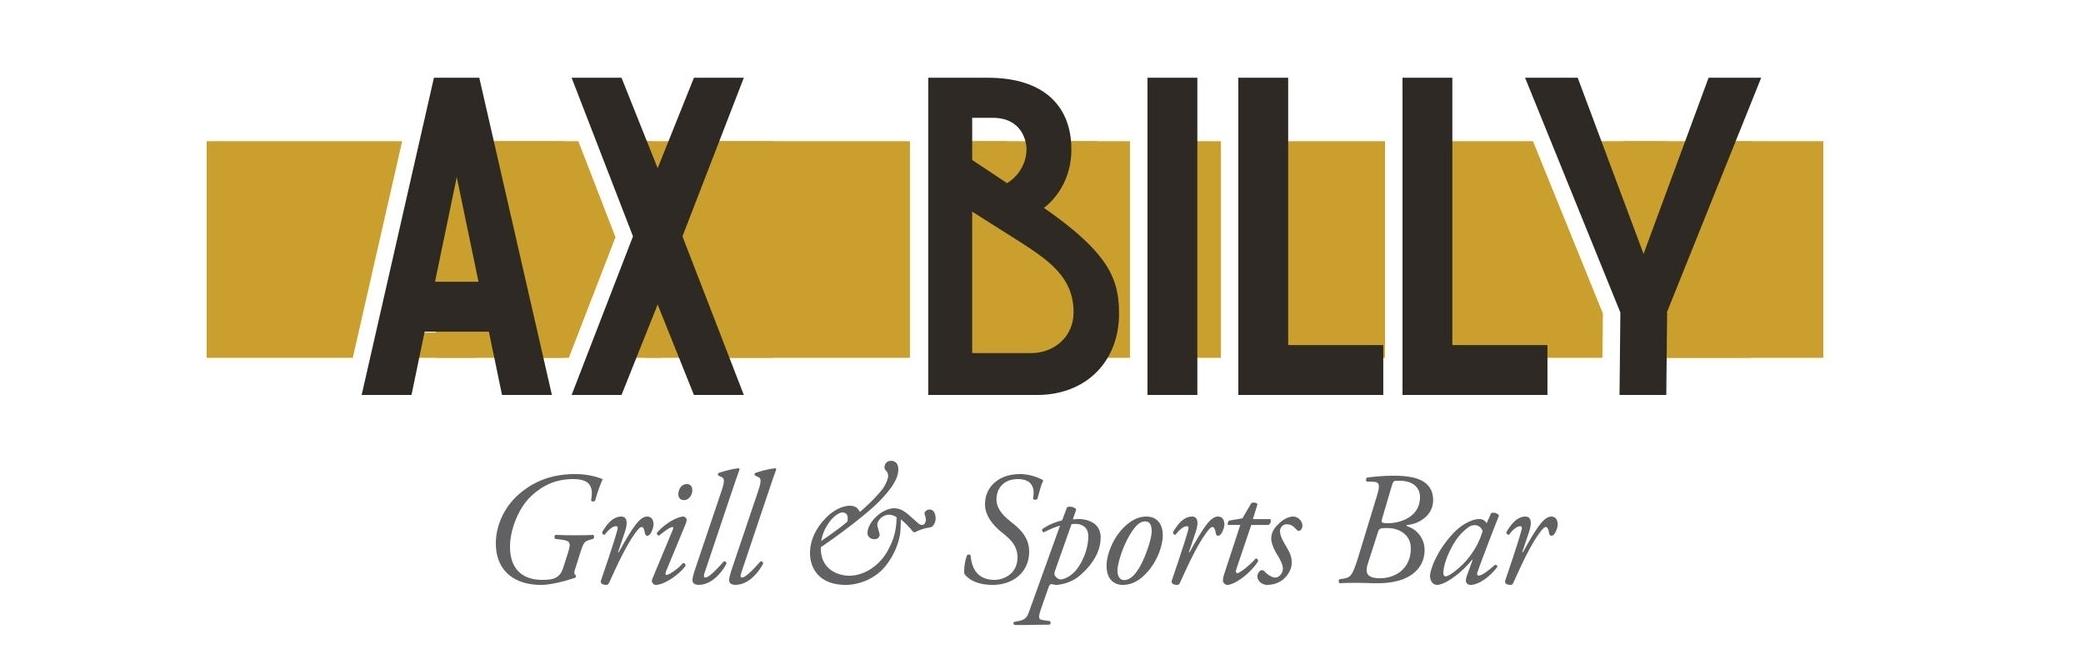 Above New Logo design: